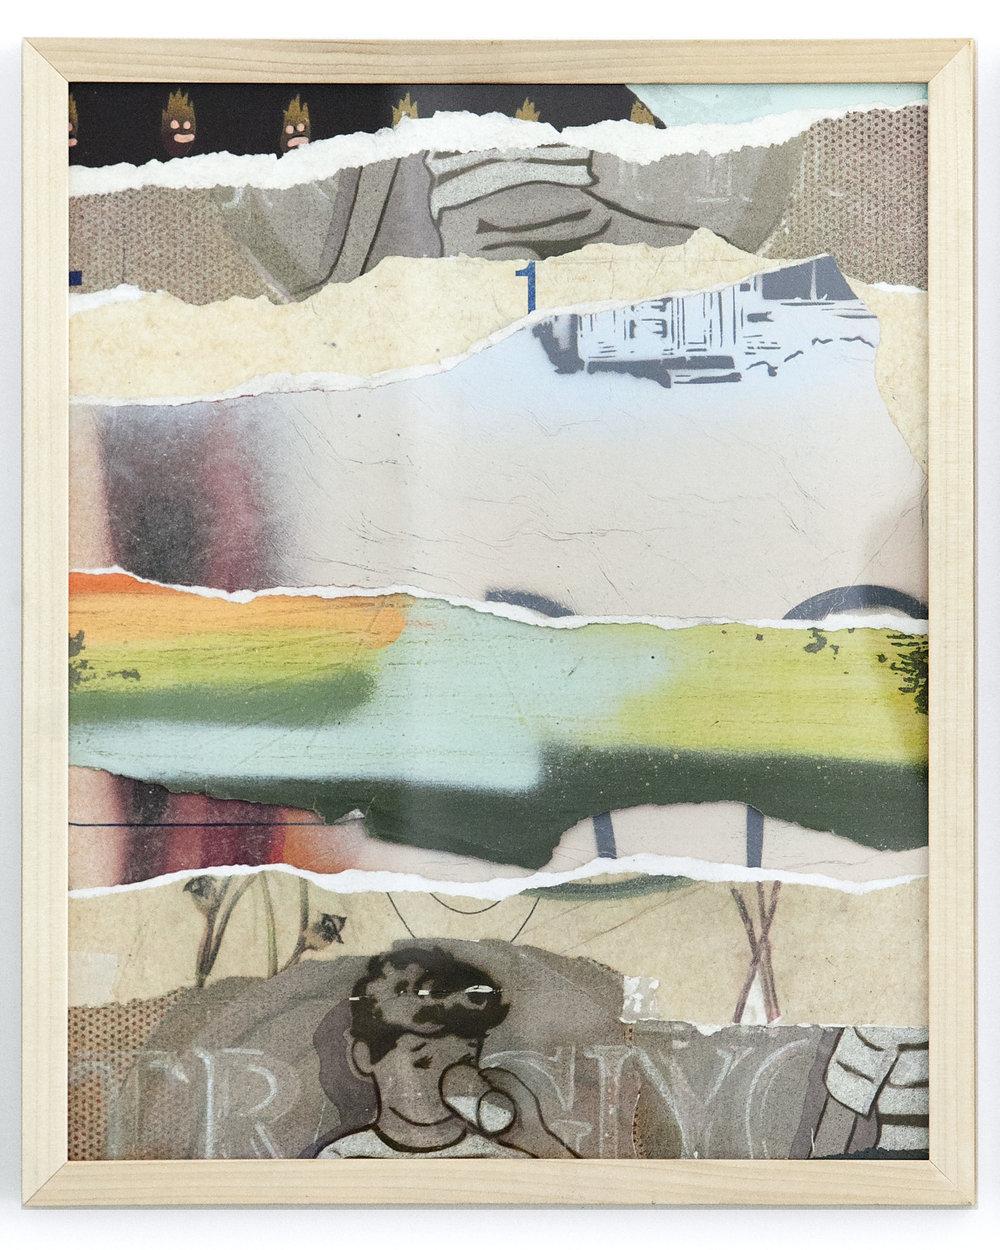 mando_collage_5.jpg